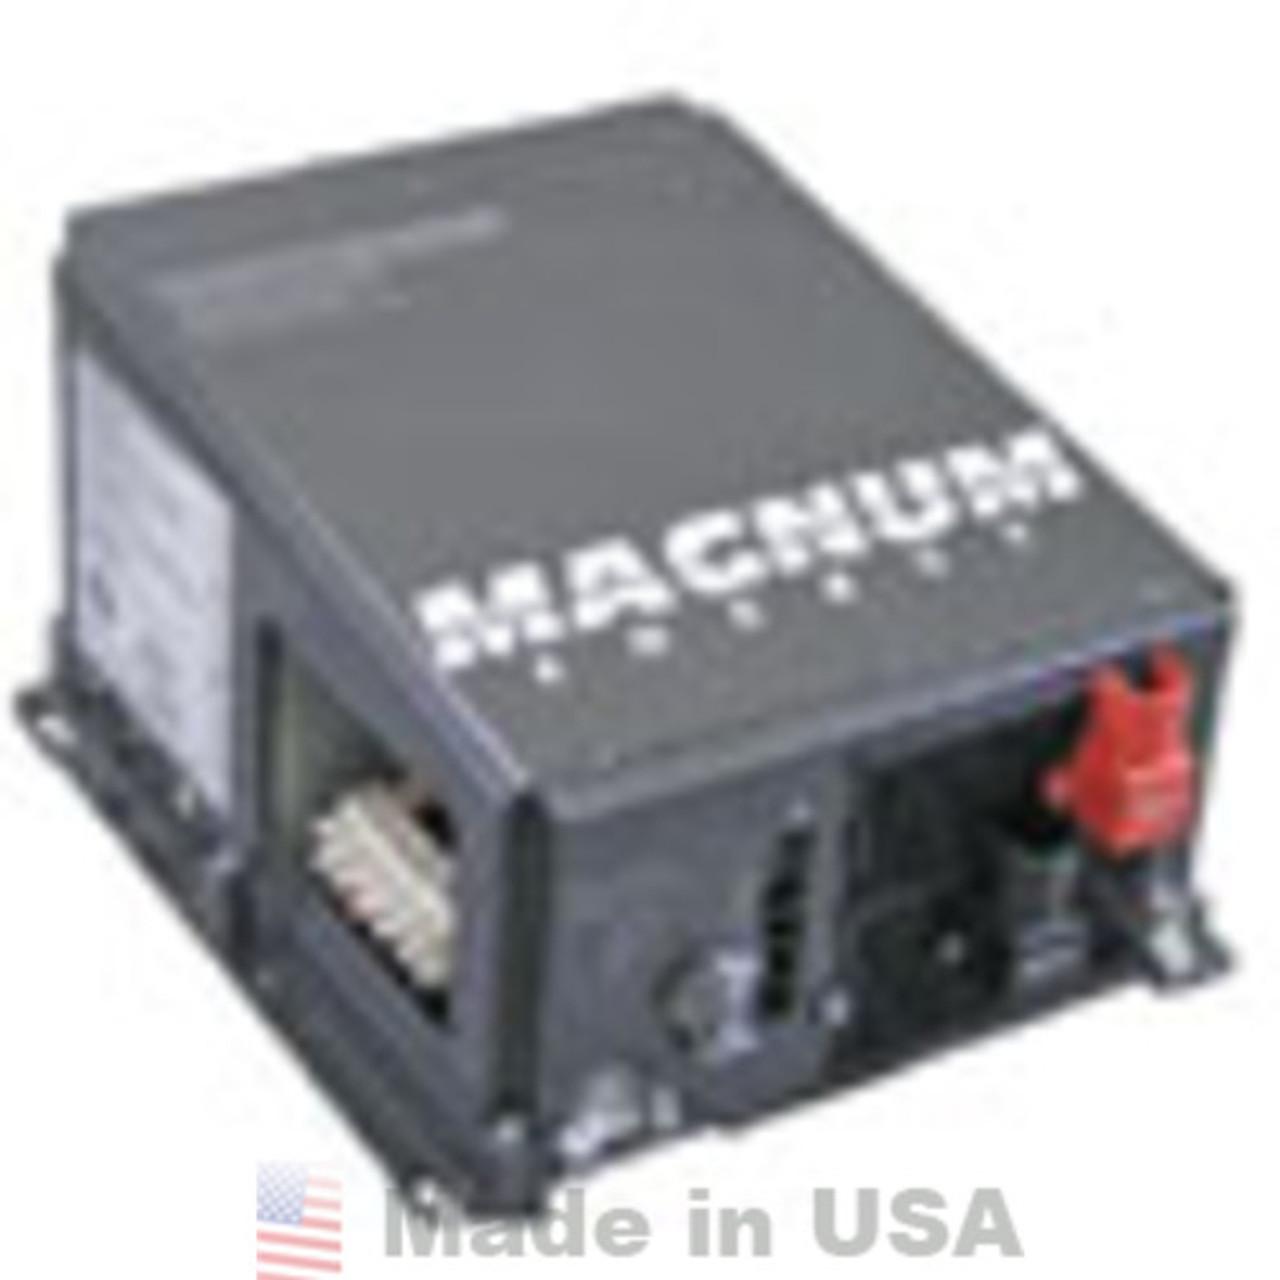 Magnum Energy RD2212 2000W, 12V Inverter/Charger